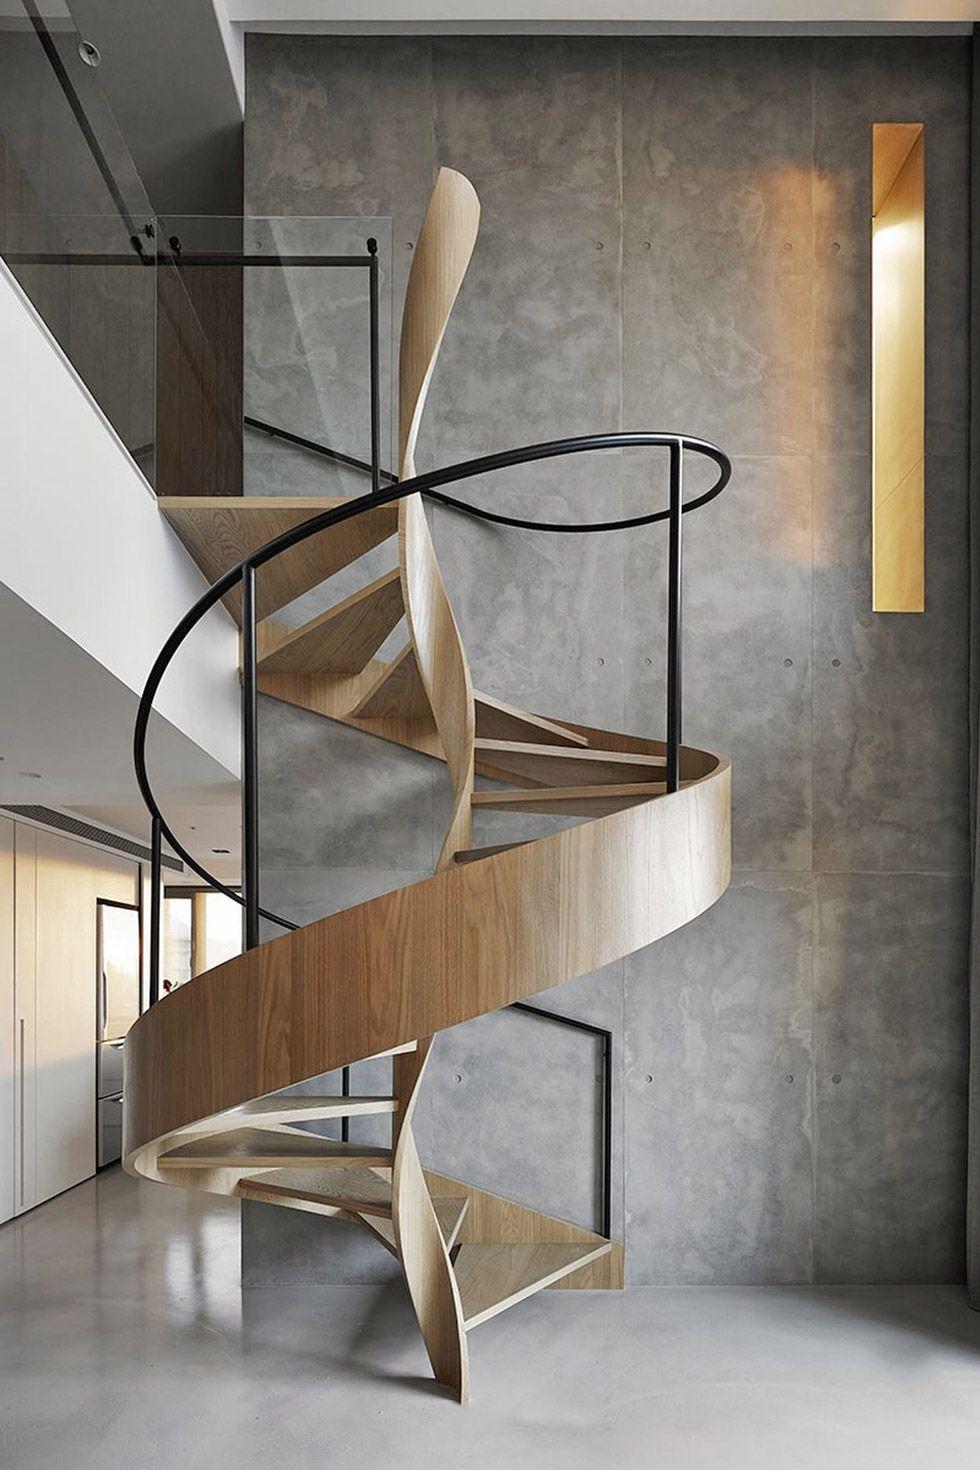 Scale interne guida completa alla scelta 25 idee moderne stairs pinterest architettura - Idee architettura interni ...